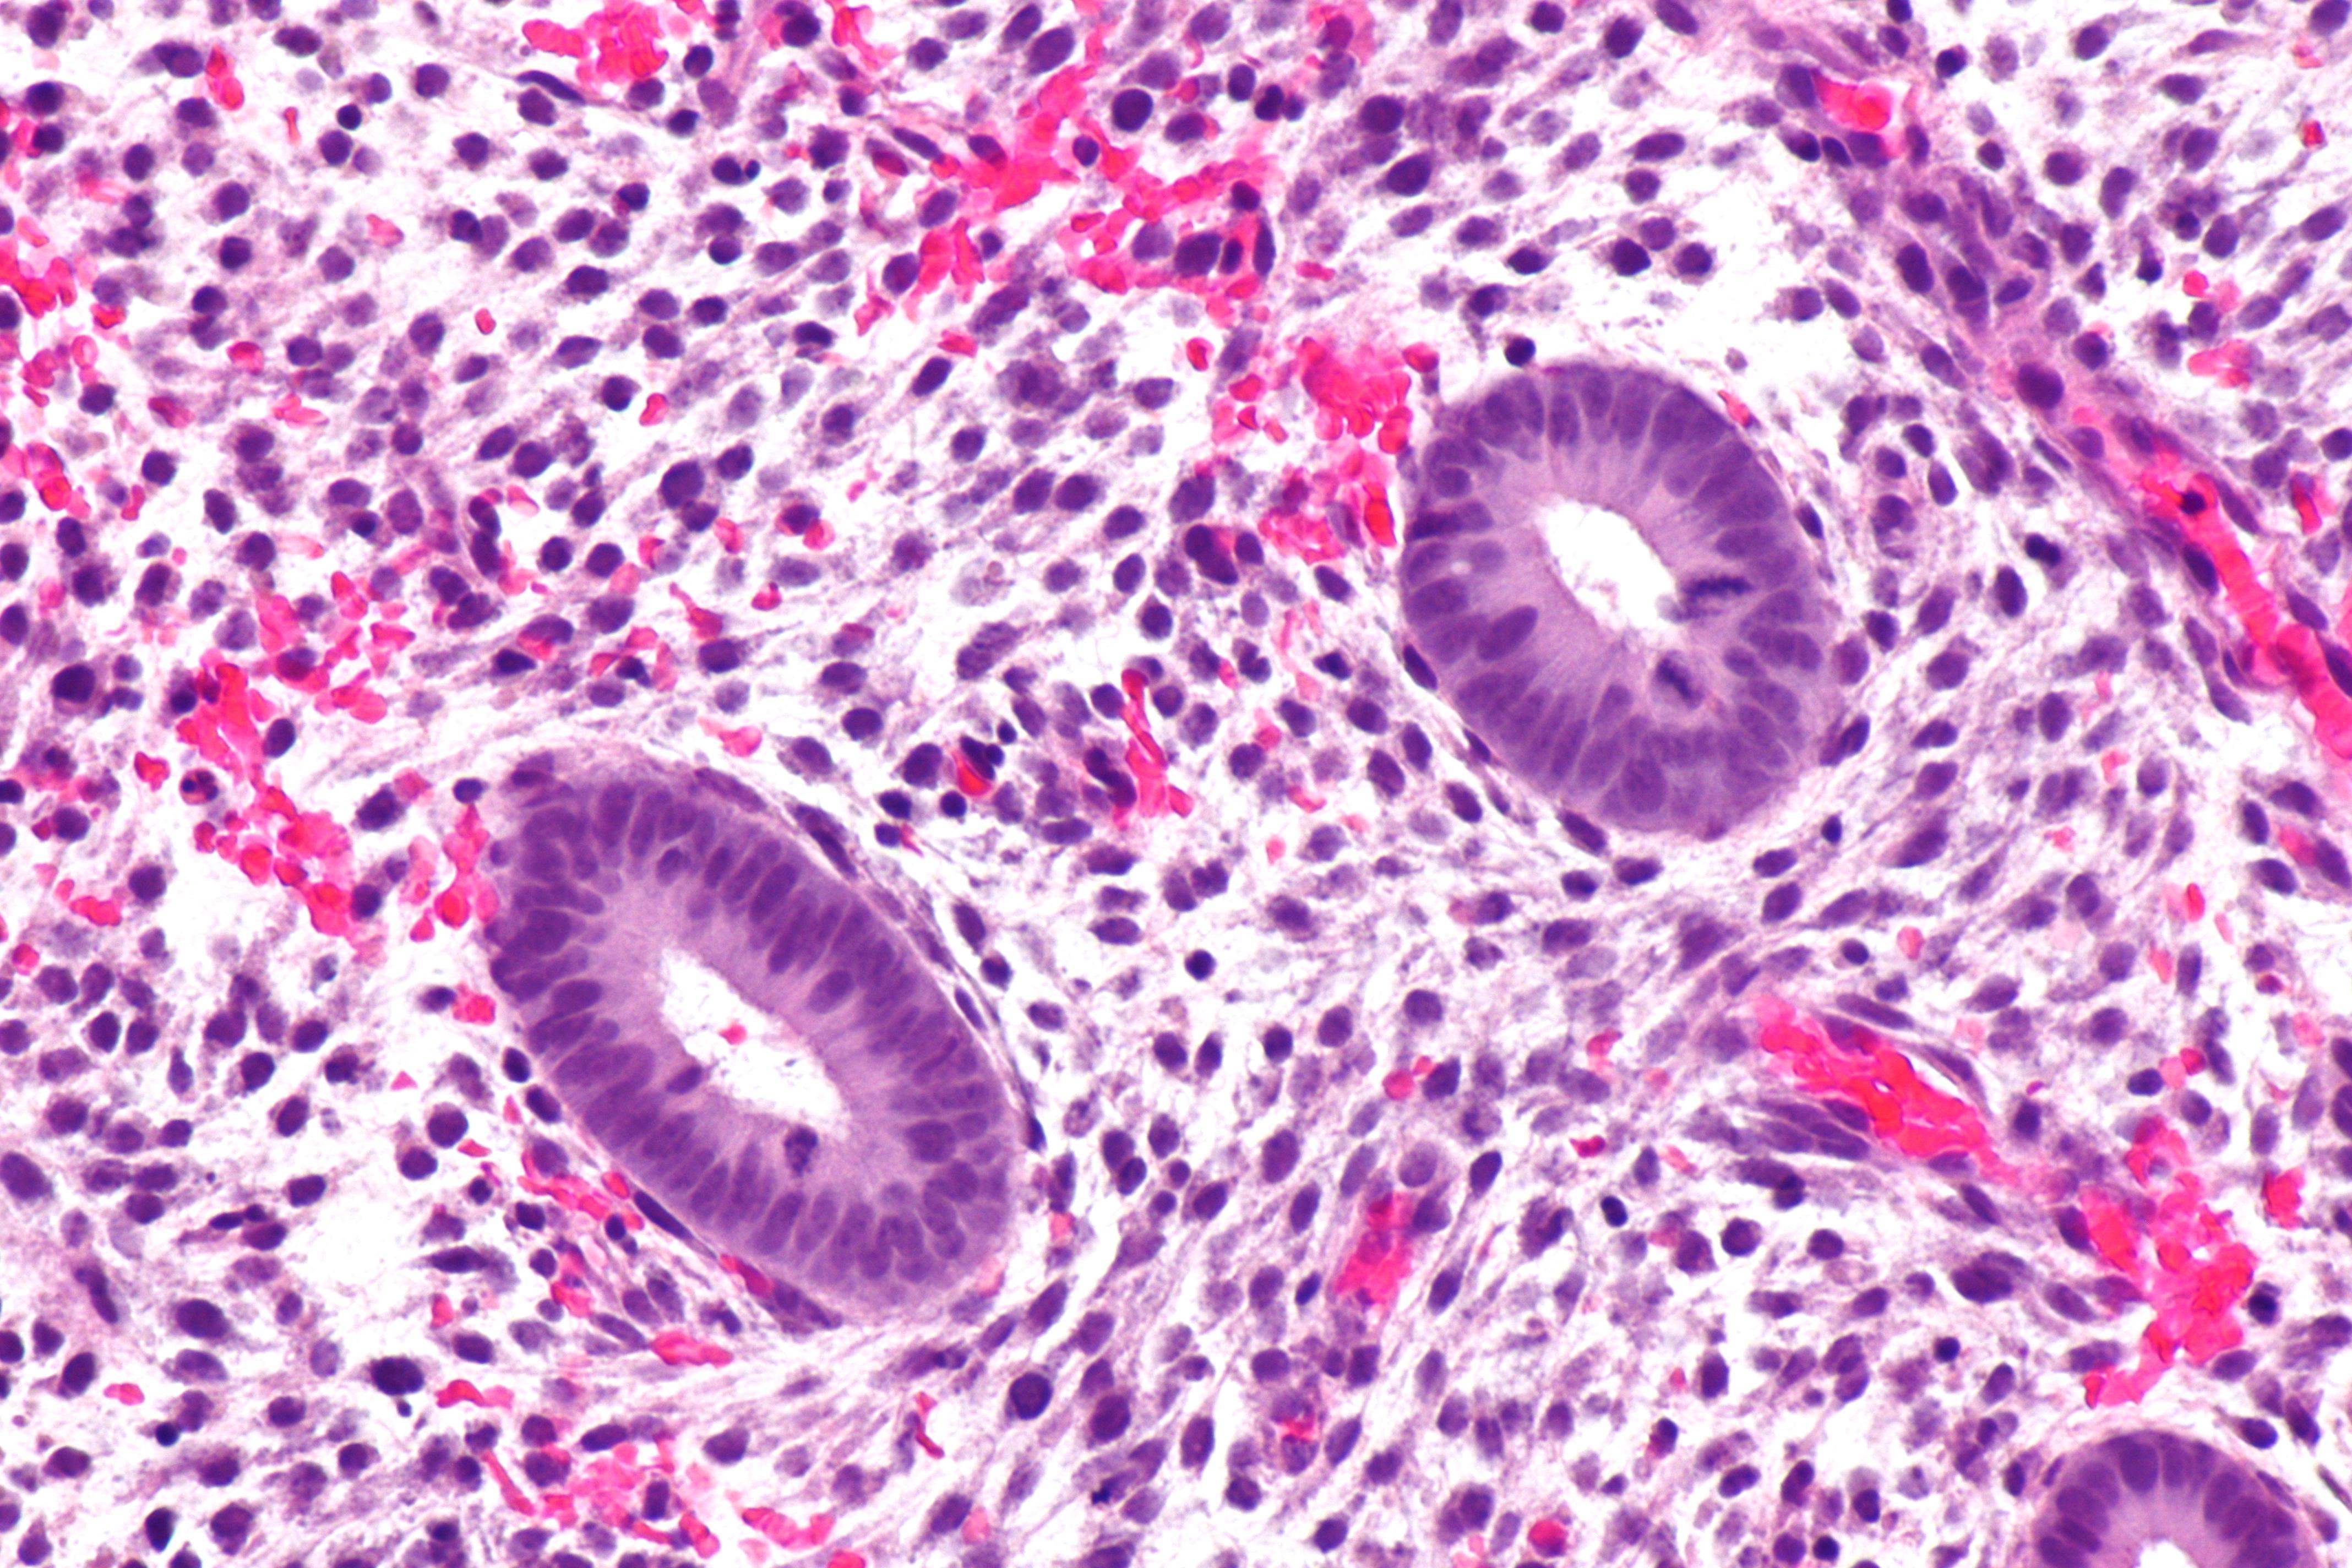 File:Proliferative endometrium - very high mag.jpg ...